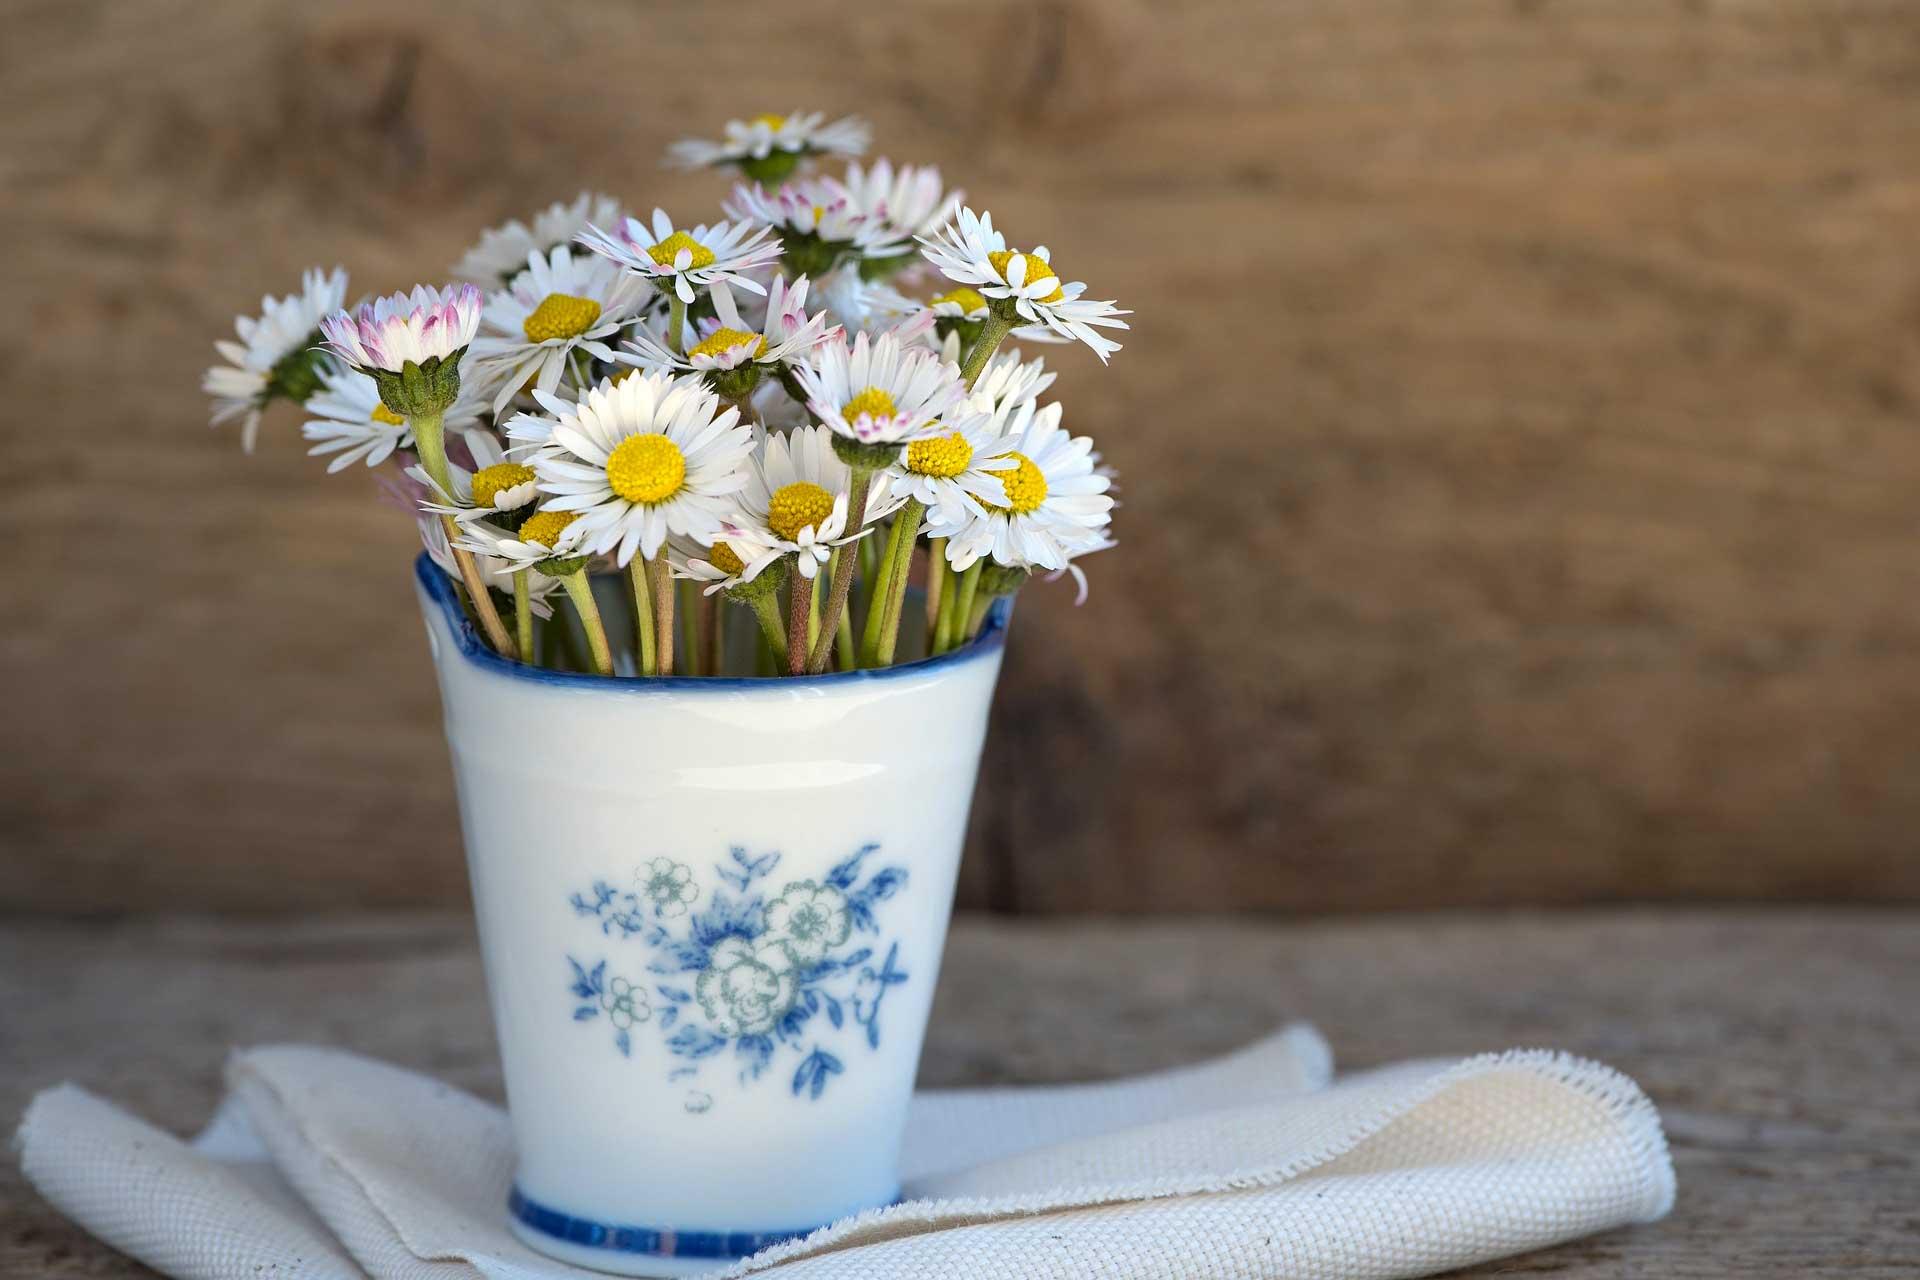 Fiori Felici Tra Gardening, Slow Flowers E Floral Design